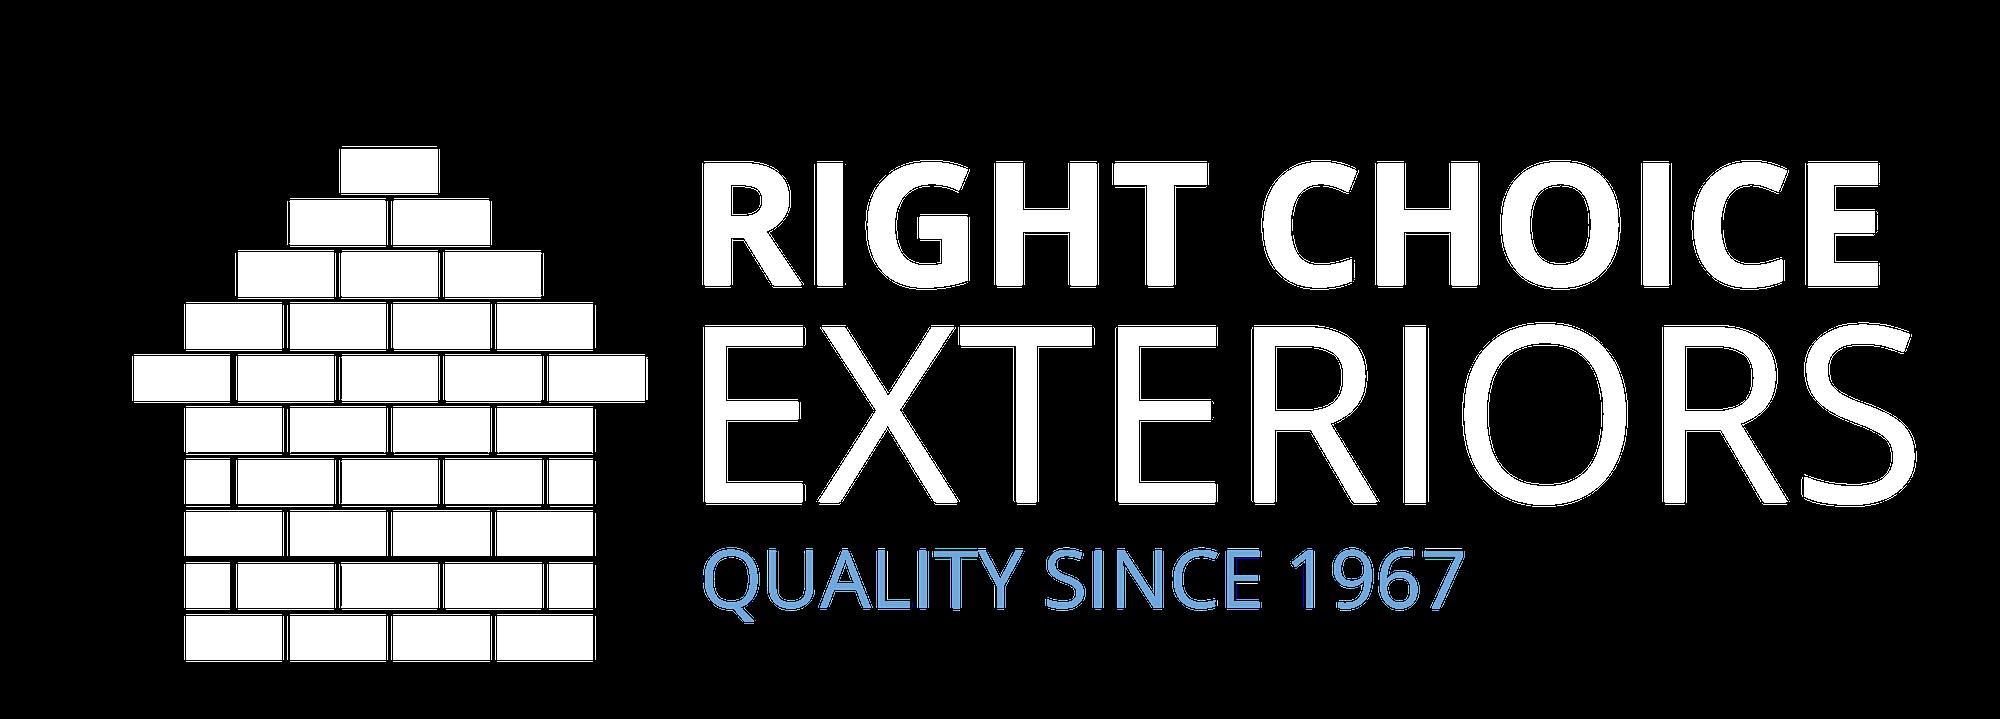 Right Choice Exteriors